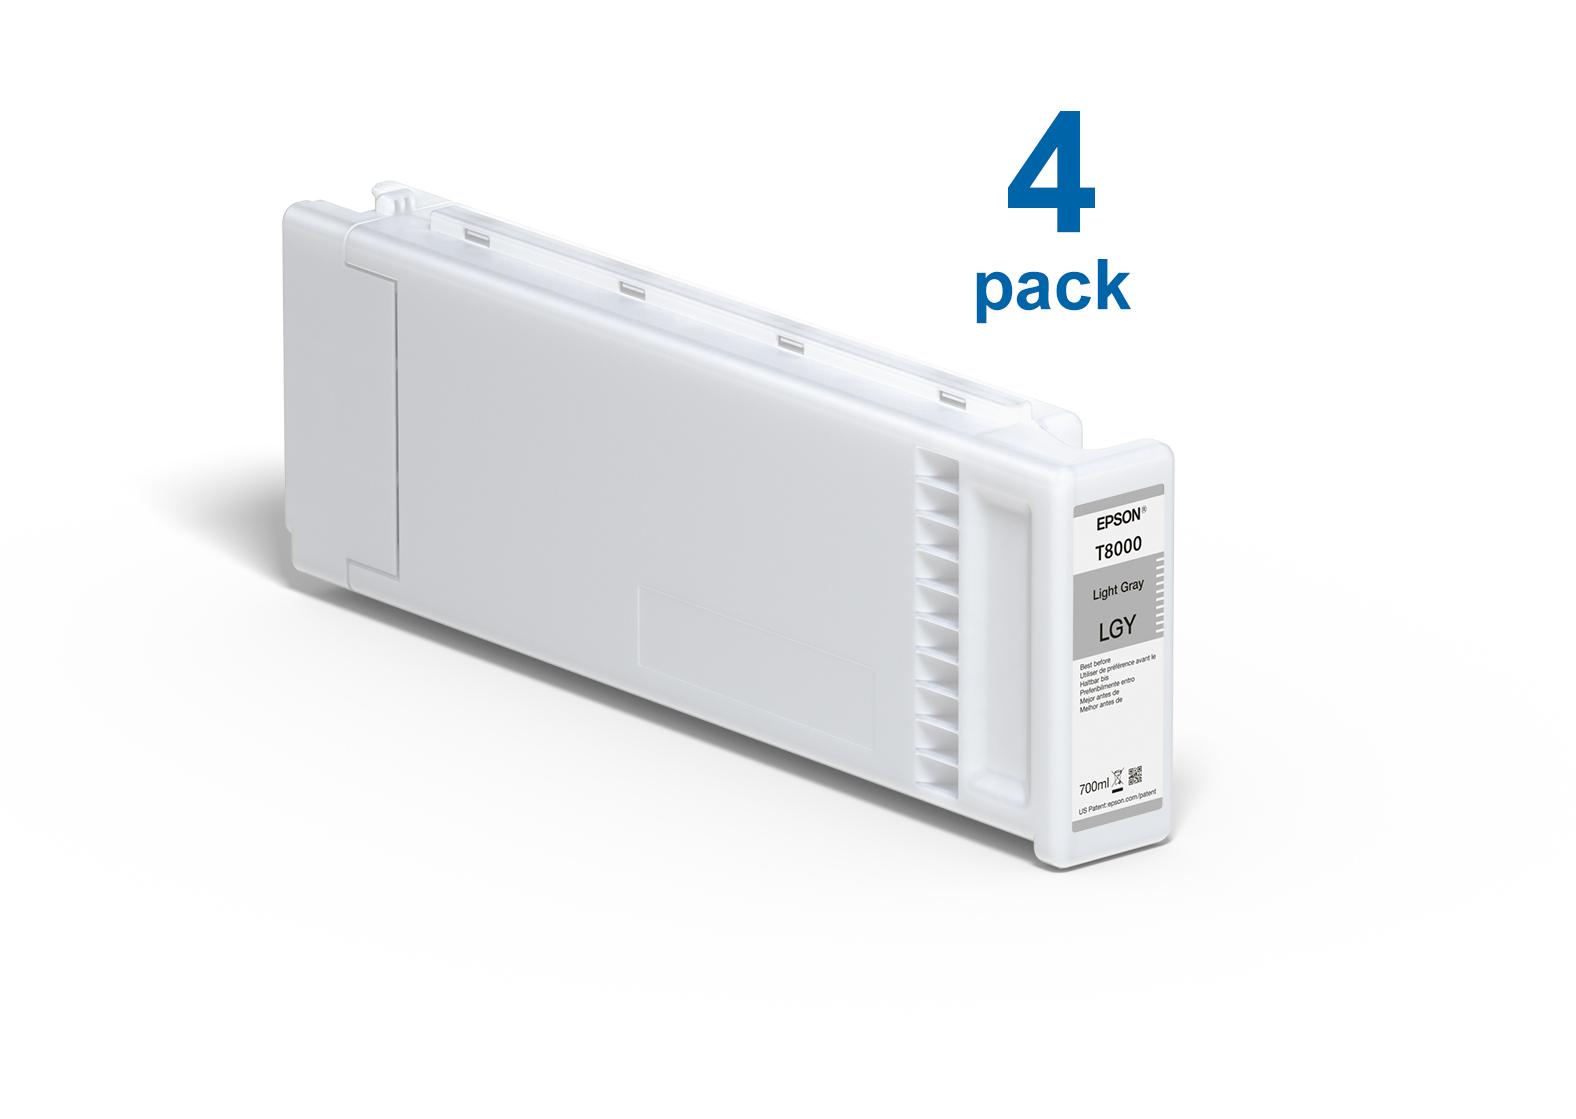 UltraChrome Pro Light Gray 700ml Ink (4 Pack) for the Epson P10000 & P20000